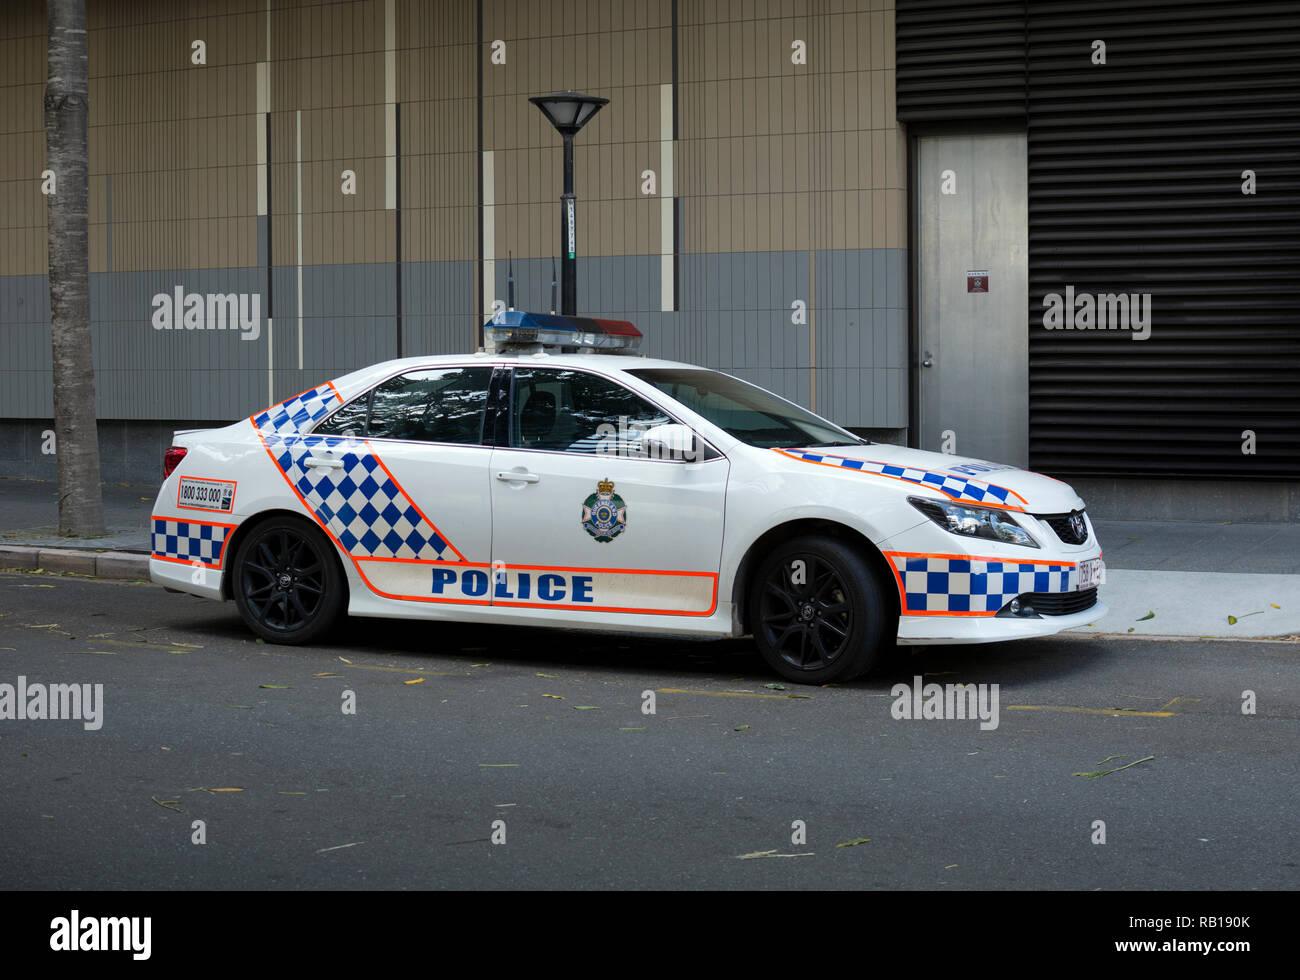 Queensland Police car, Brisbane, Queensland, Australia - Stock Image